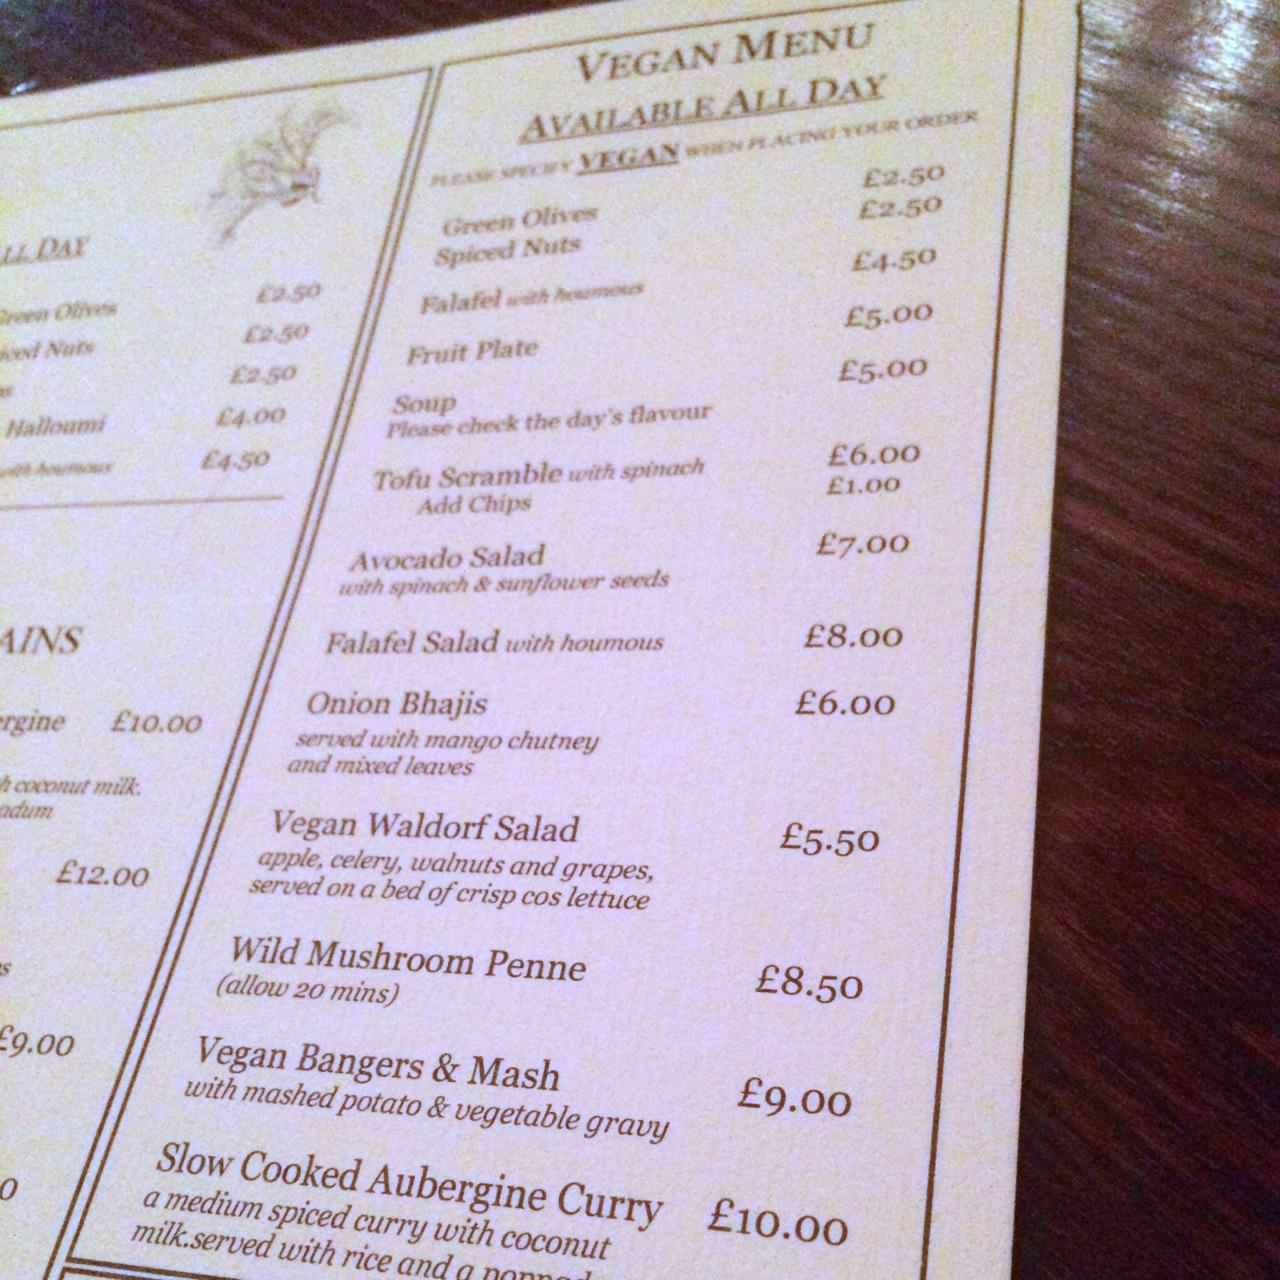 http://fatgayvegan.com/wp-content/uploads/2015/11/vegan-menu-2-oxford-place.jpg